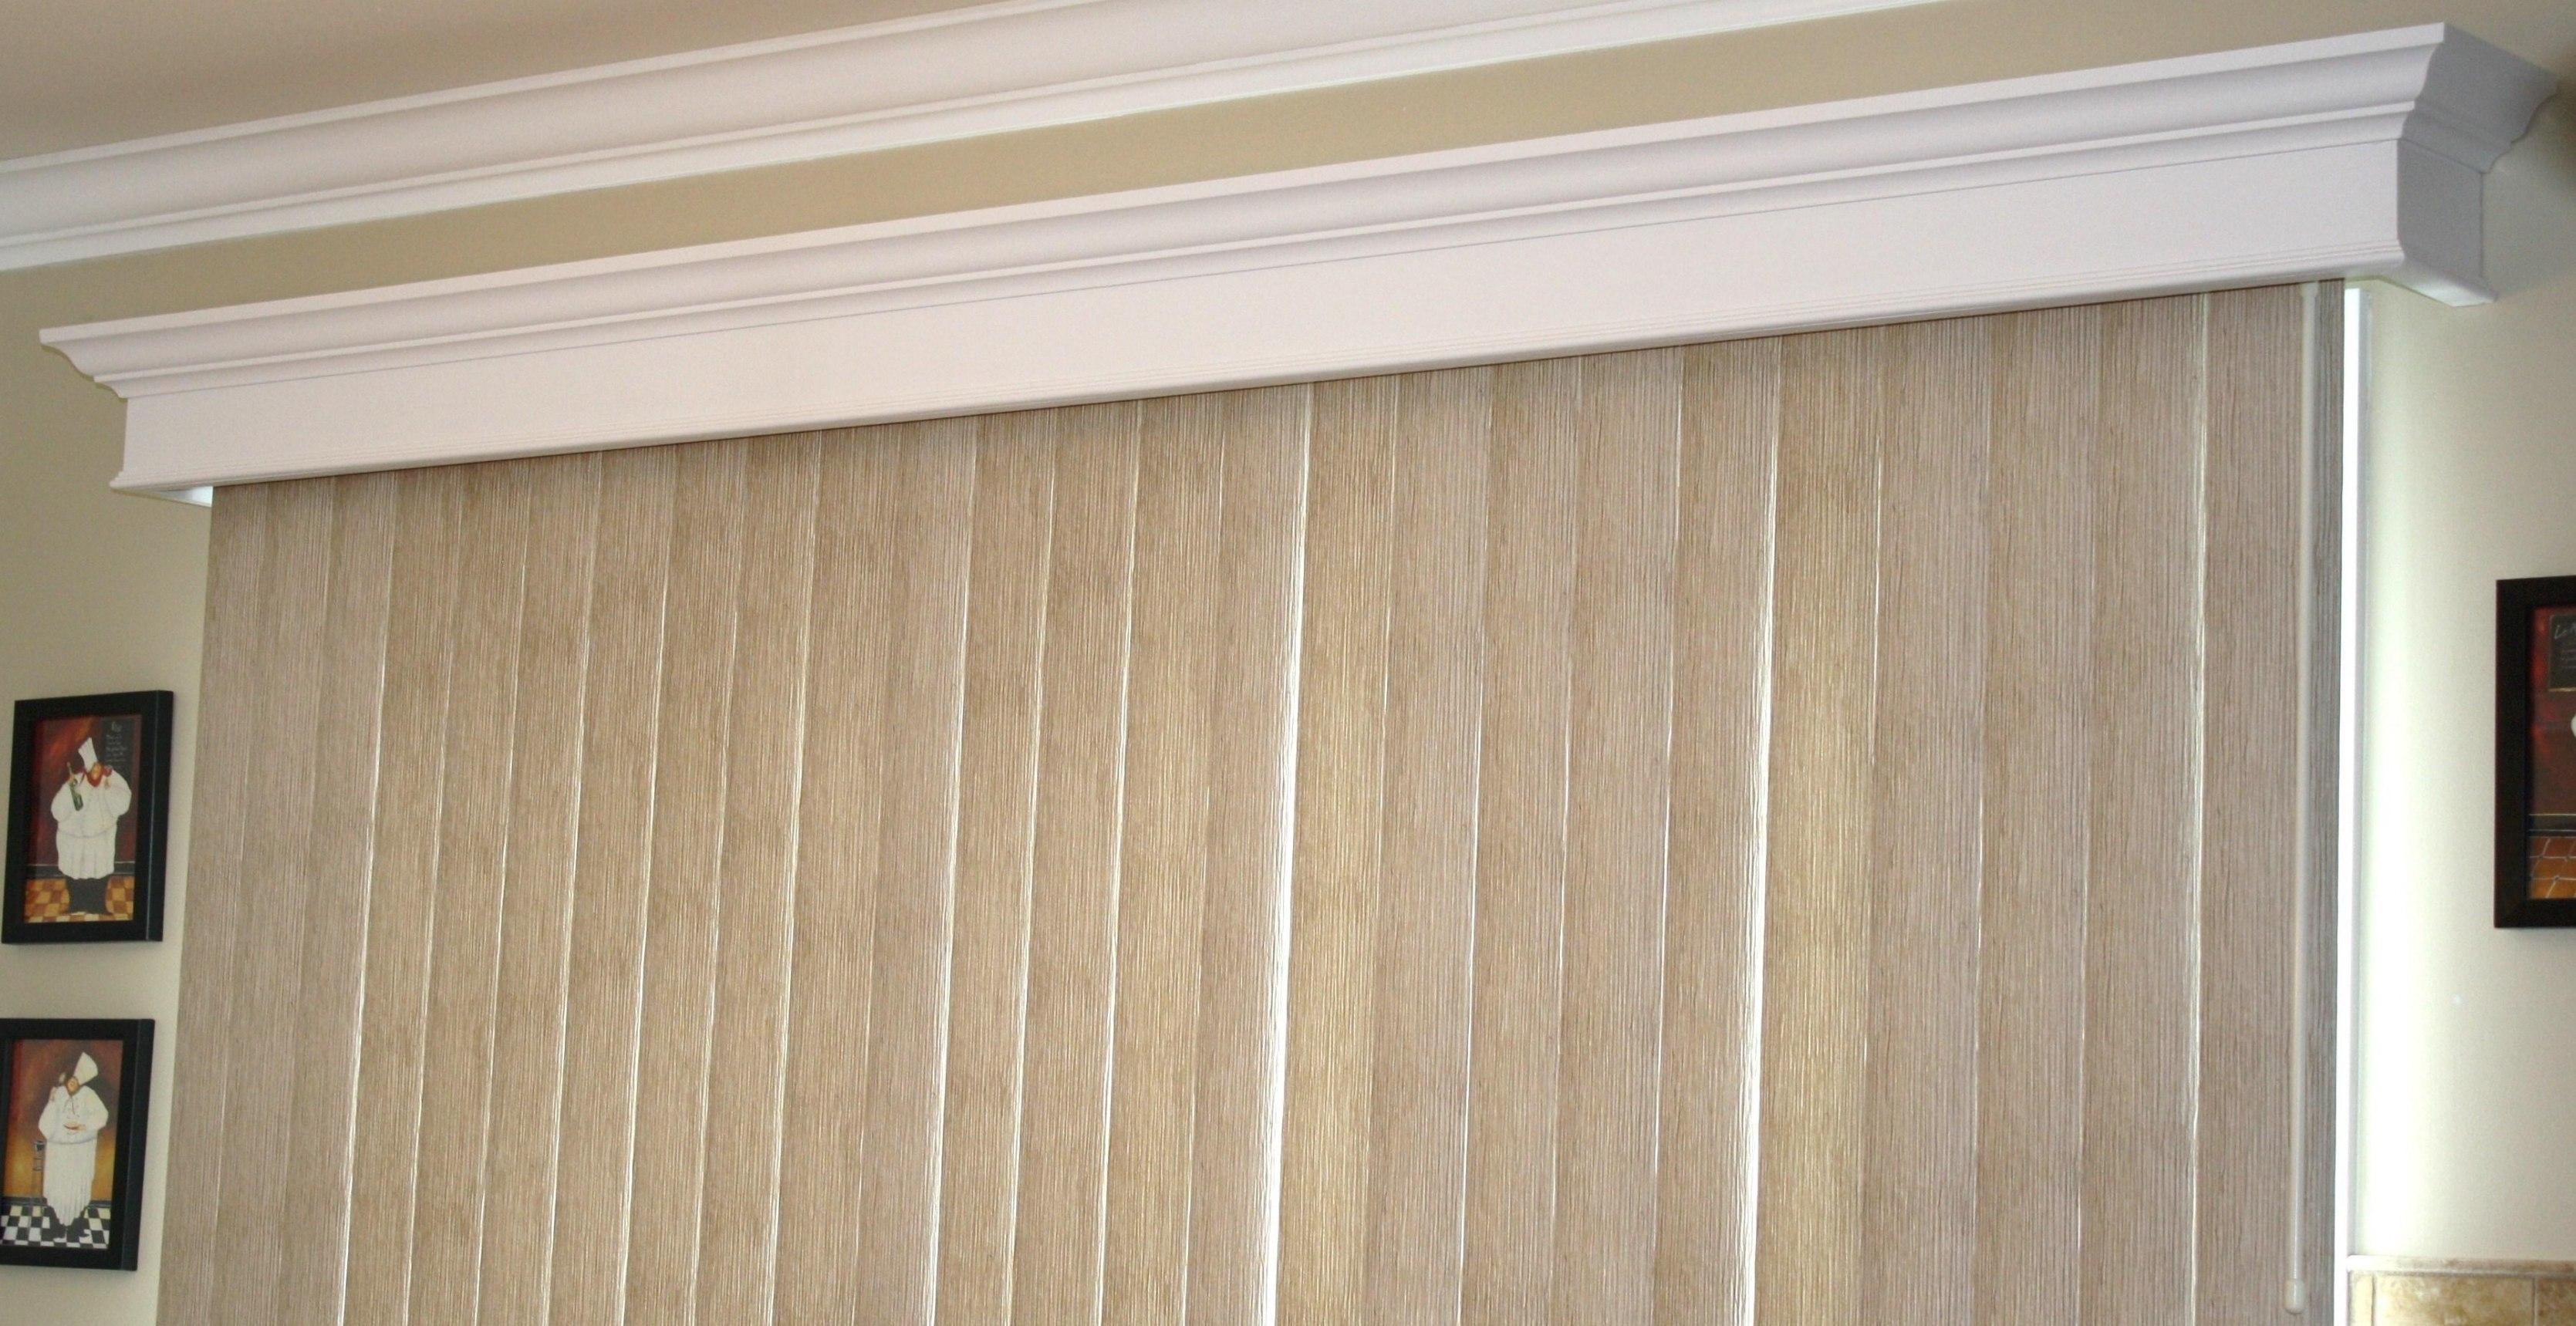 Wood Cornices For Sliding Glass DoorsWood Cornices For Sliding Glass Doors